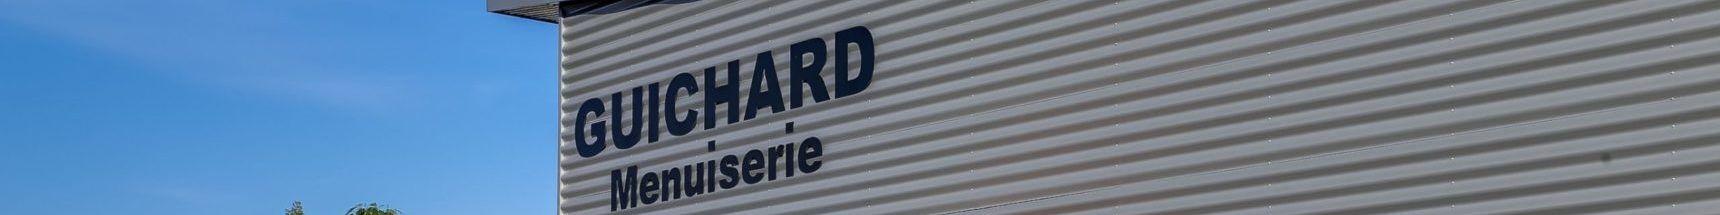 Guichard Agencement-Charpente-Ossature bois